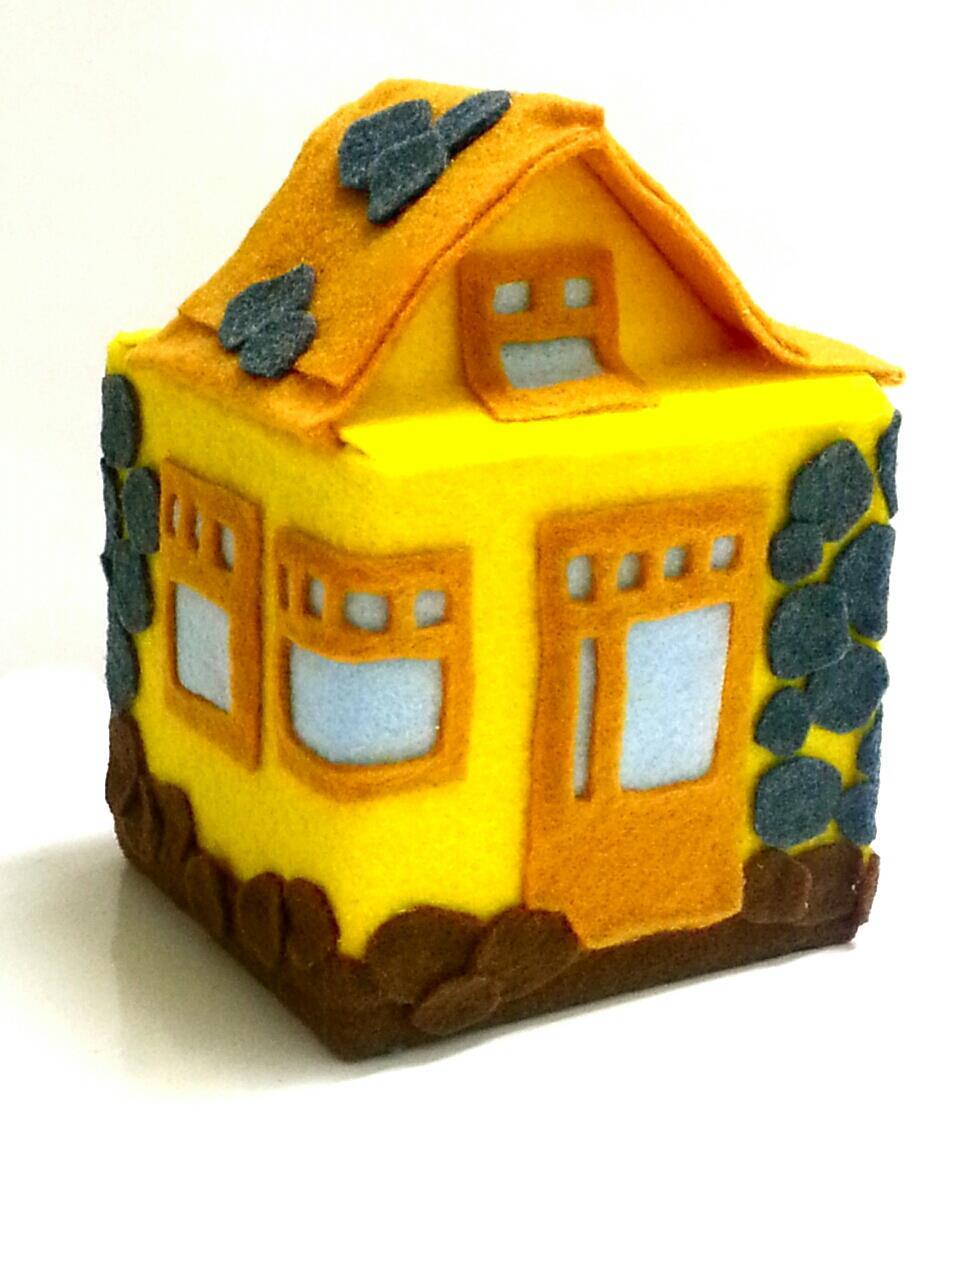 015.The Remodel Modren House